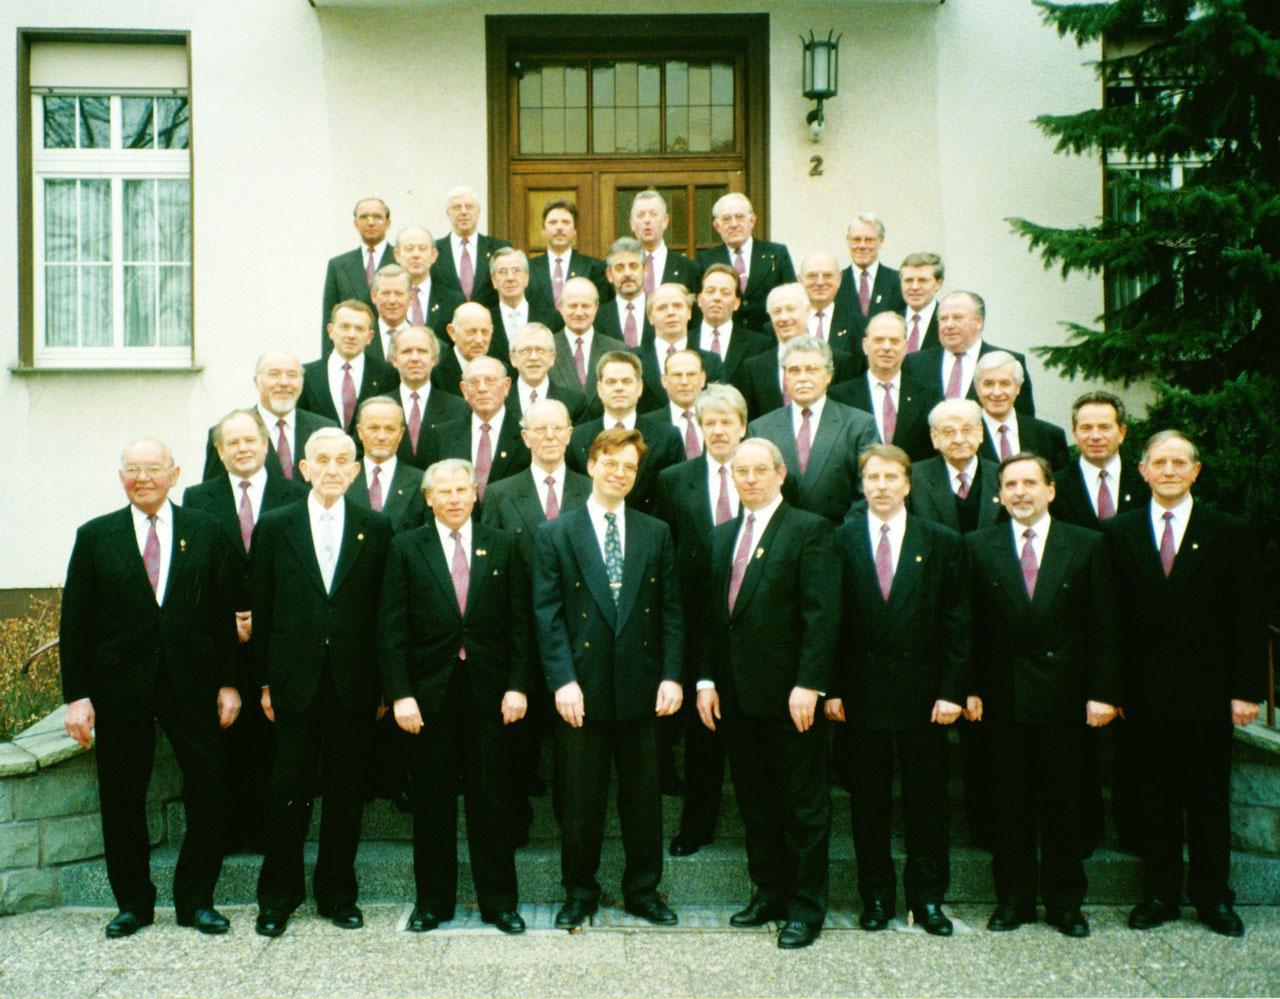 5. Meisterchor 1997 Attendorn,  Foto März 1996 Pfarrhaus St. Petri Hüsten